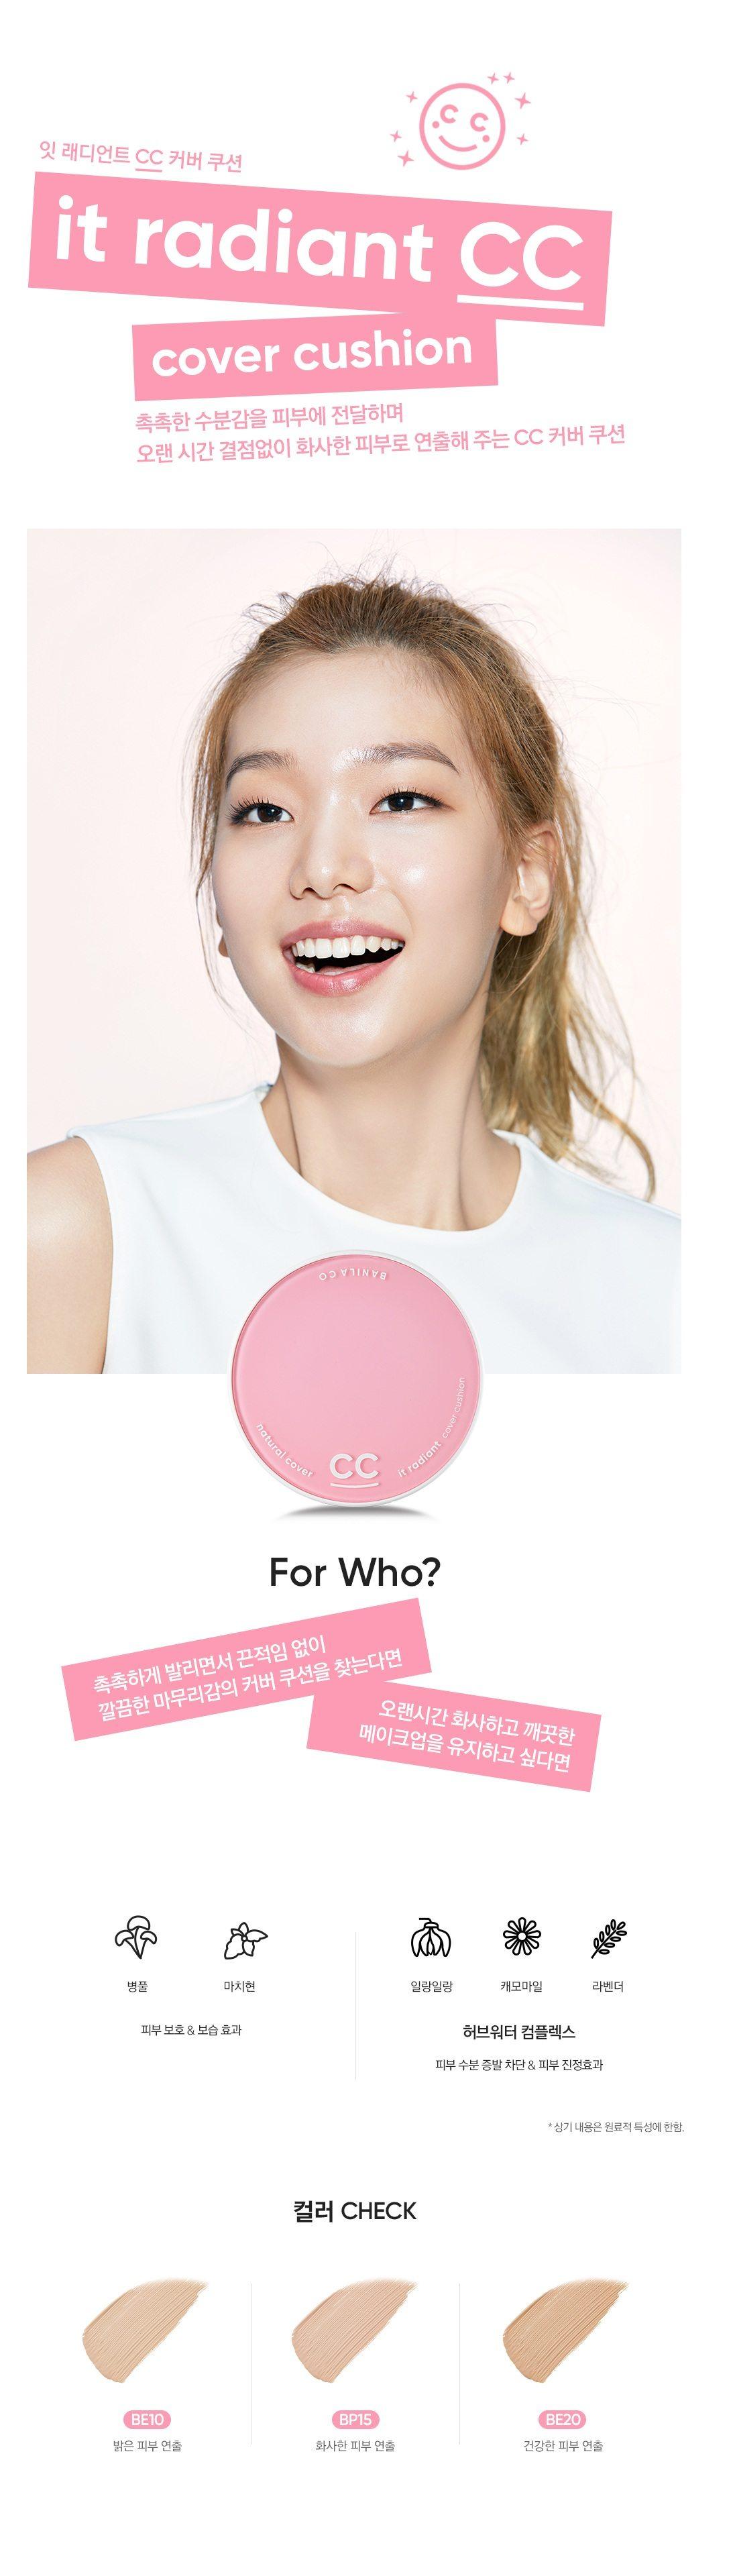 Banila Co It Radiant CC Cover Cushion With Refill korean cosmetic skincare product online shop malaysia macau singapore1